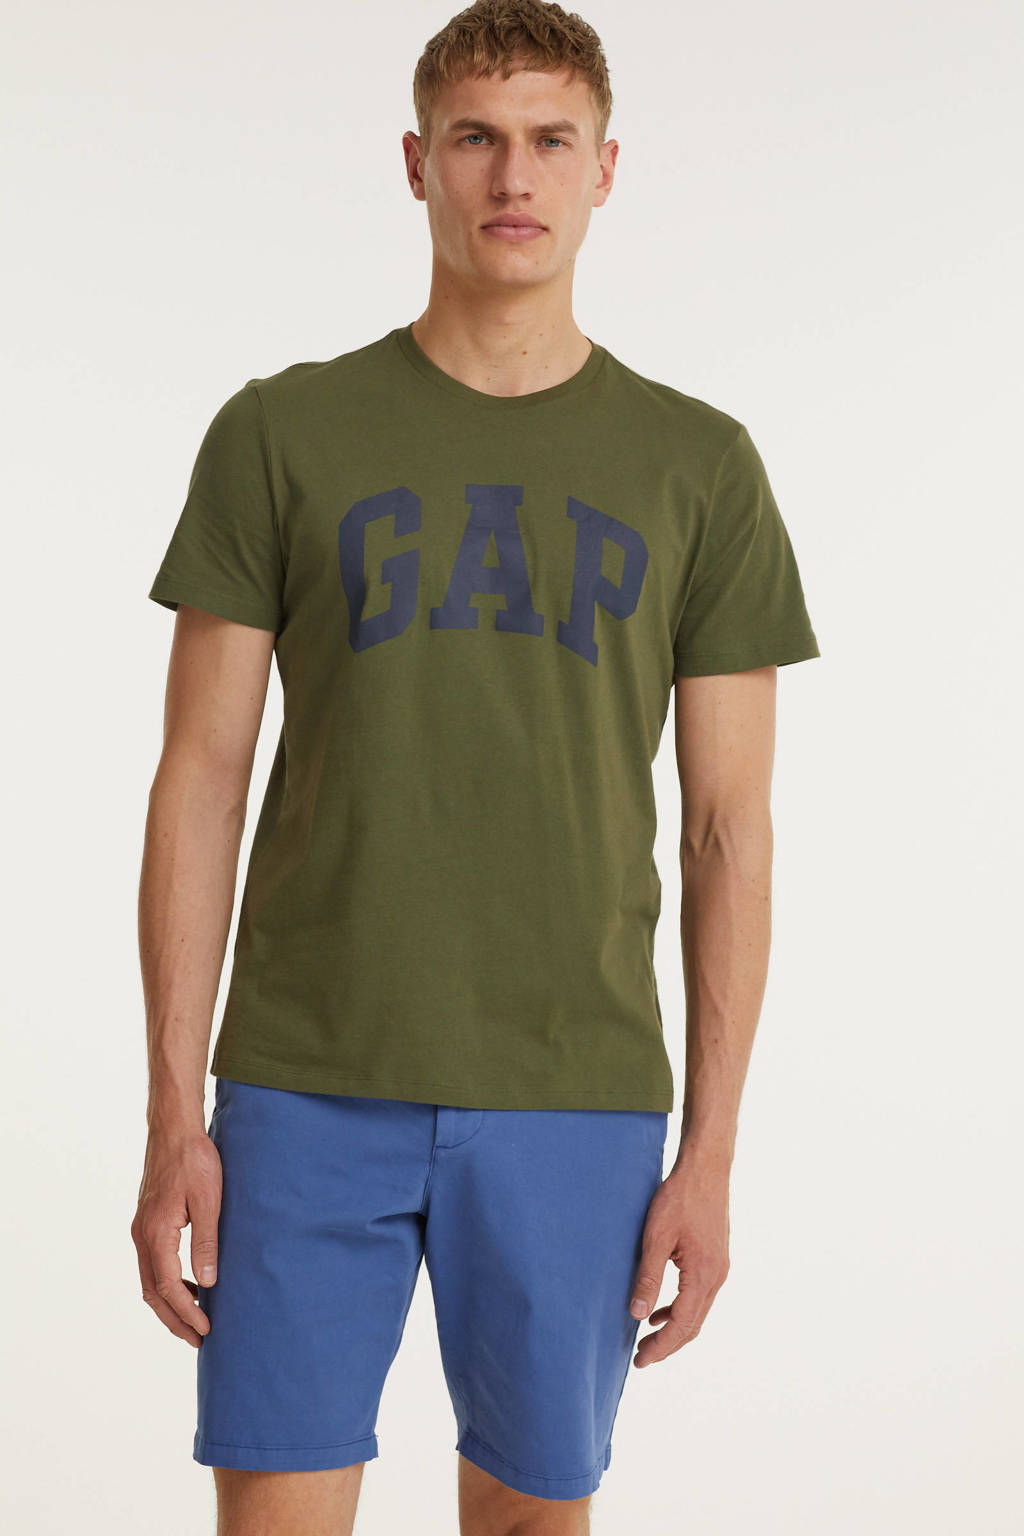 GAP T-shirt met logo army, Army